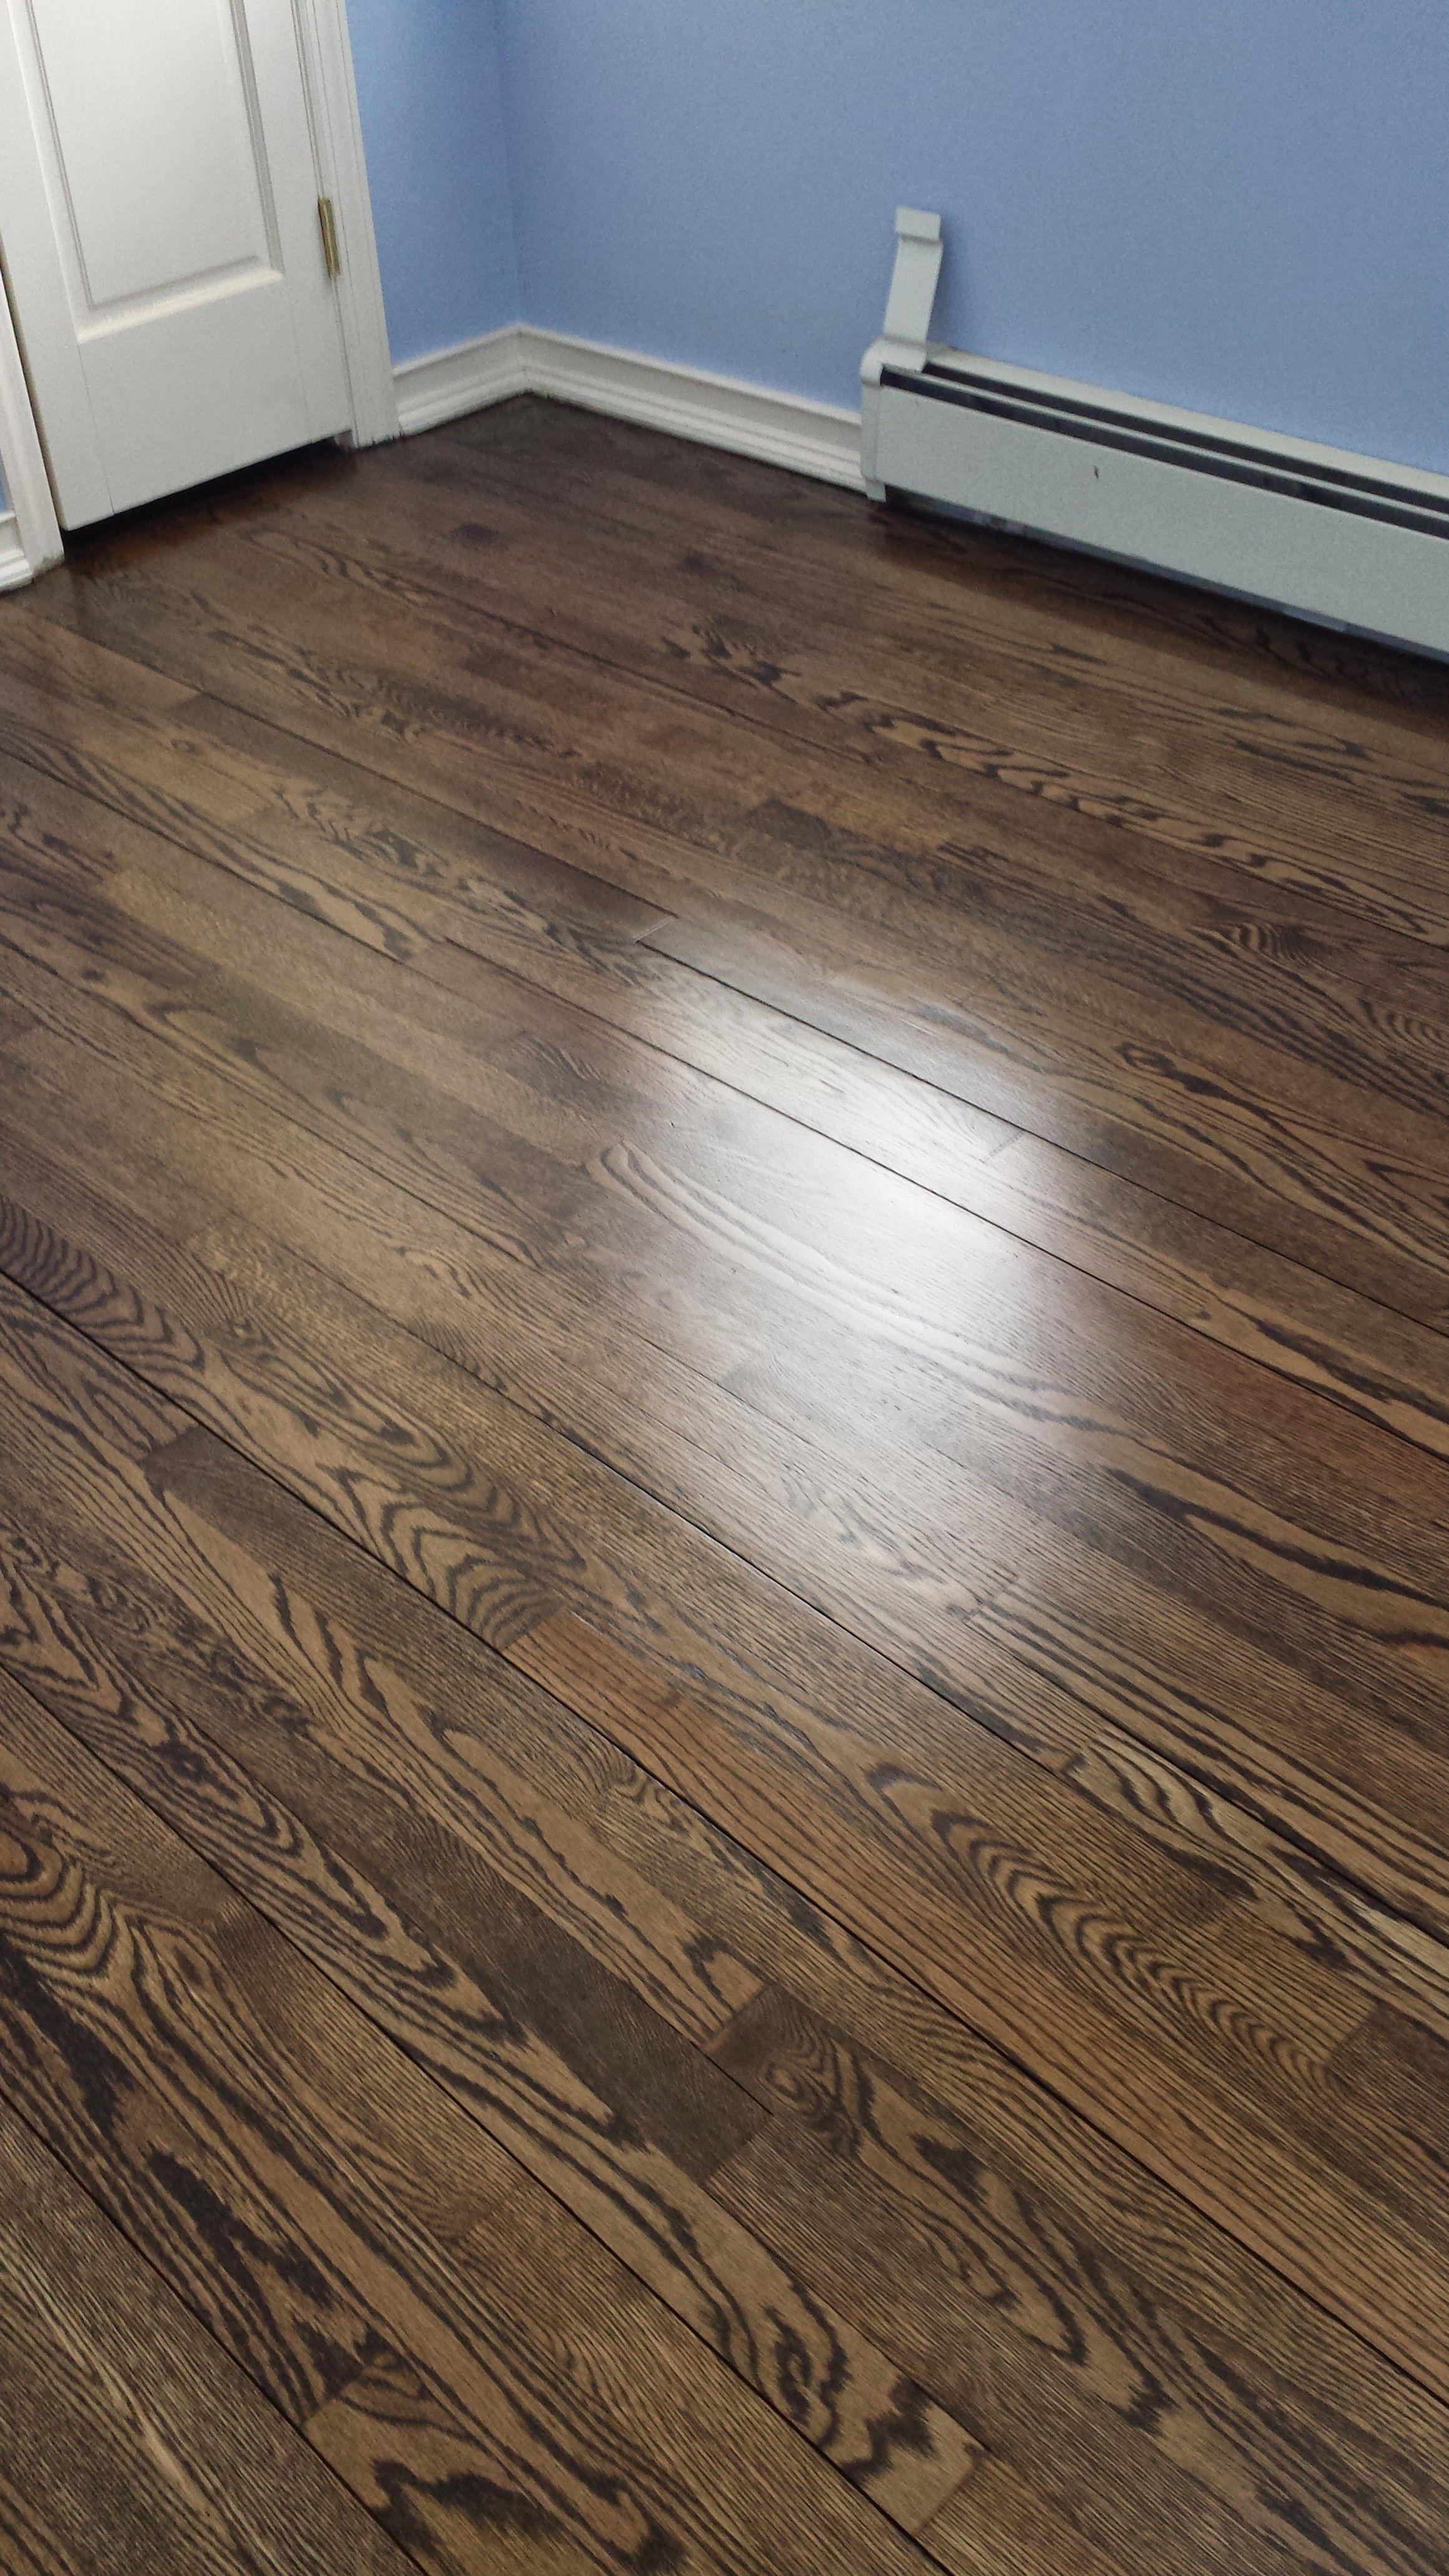 hardwood flooring bangor maine of hardwood floors vs carpet floor inside hardwood floors vs carpet great methods to use for refinishing hardwood floors